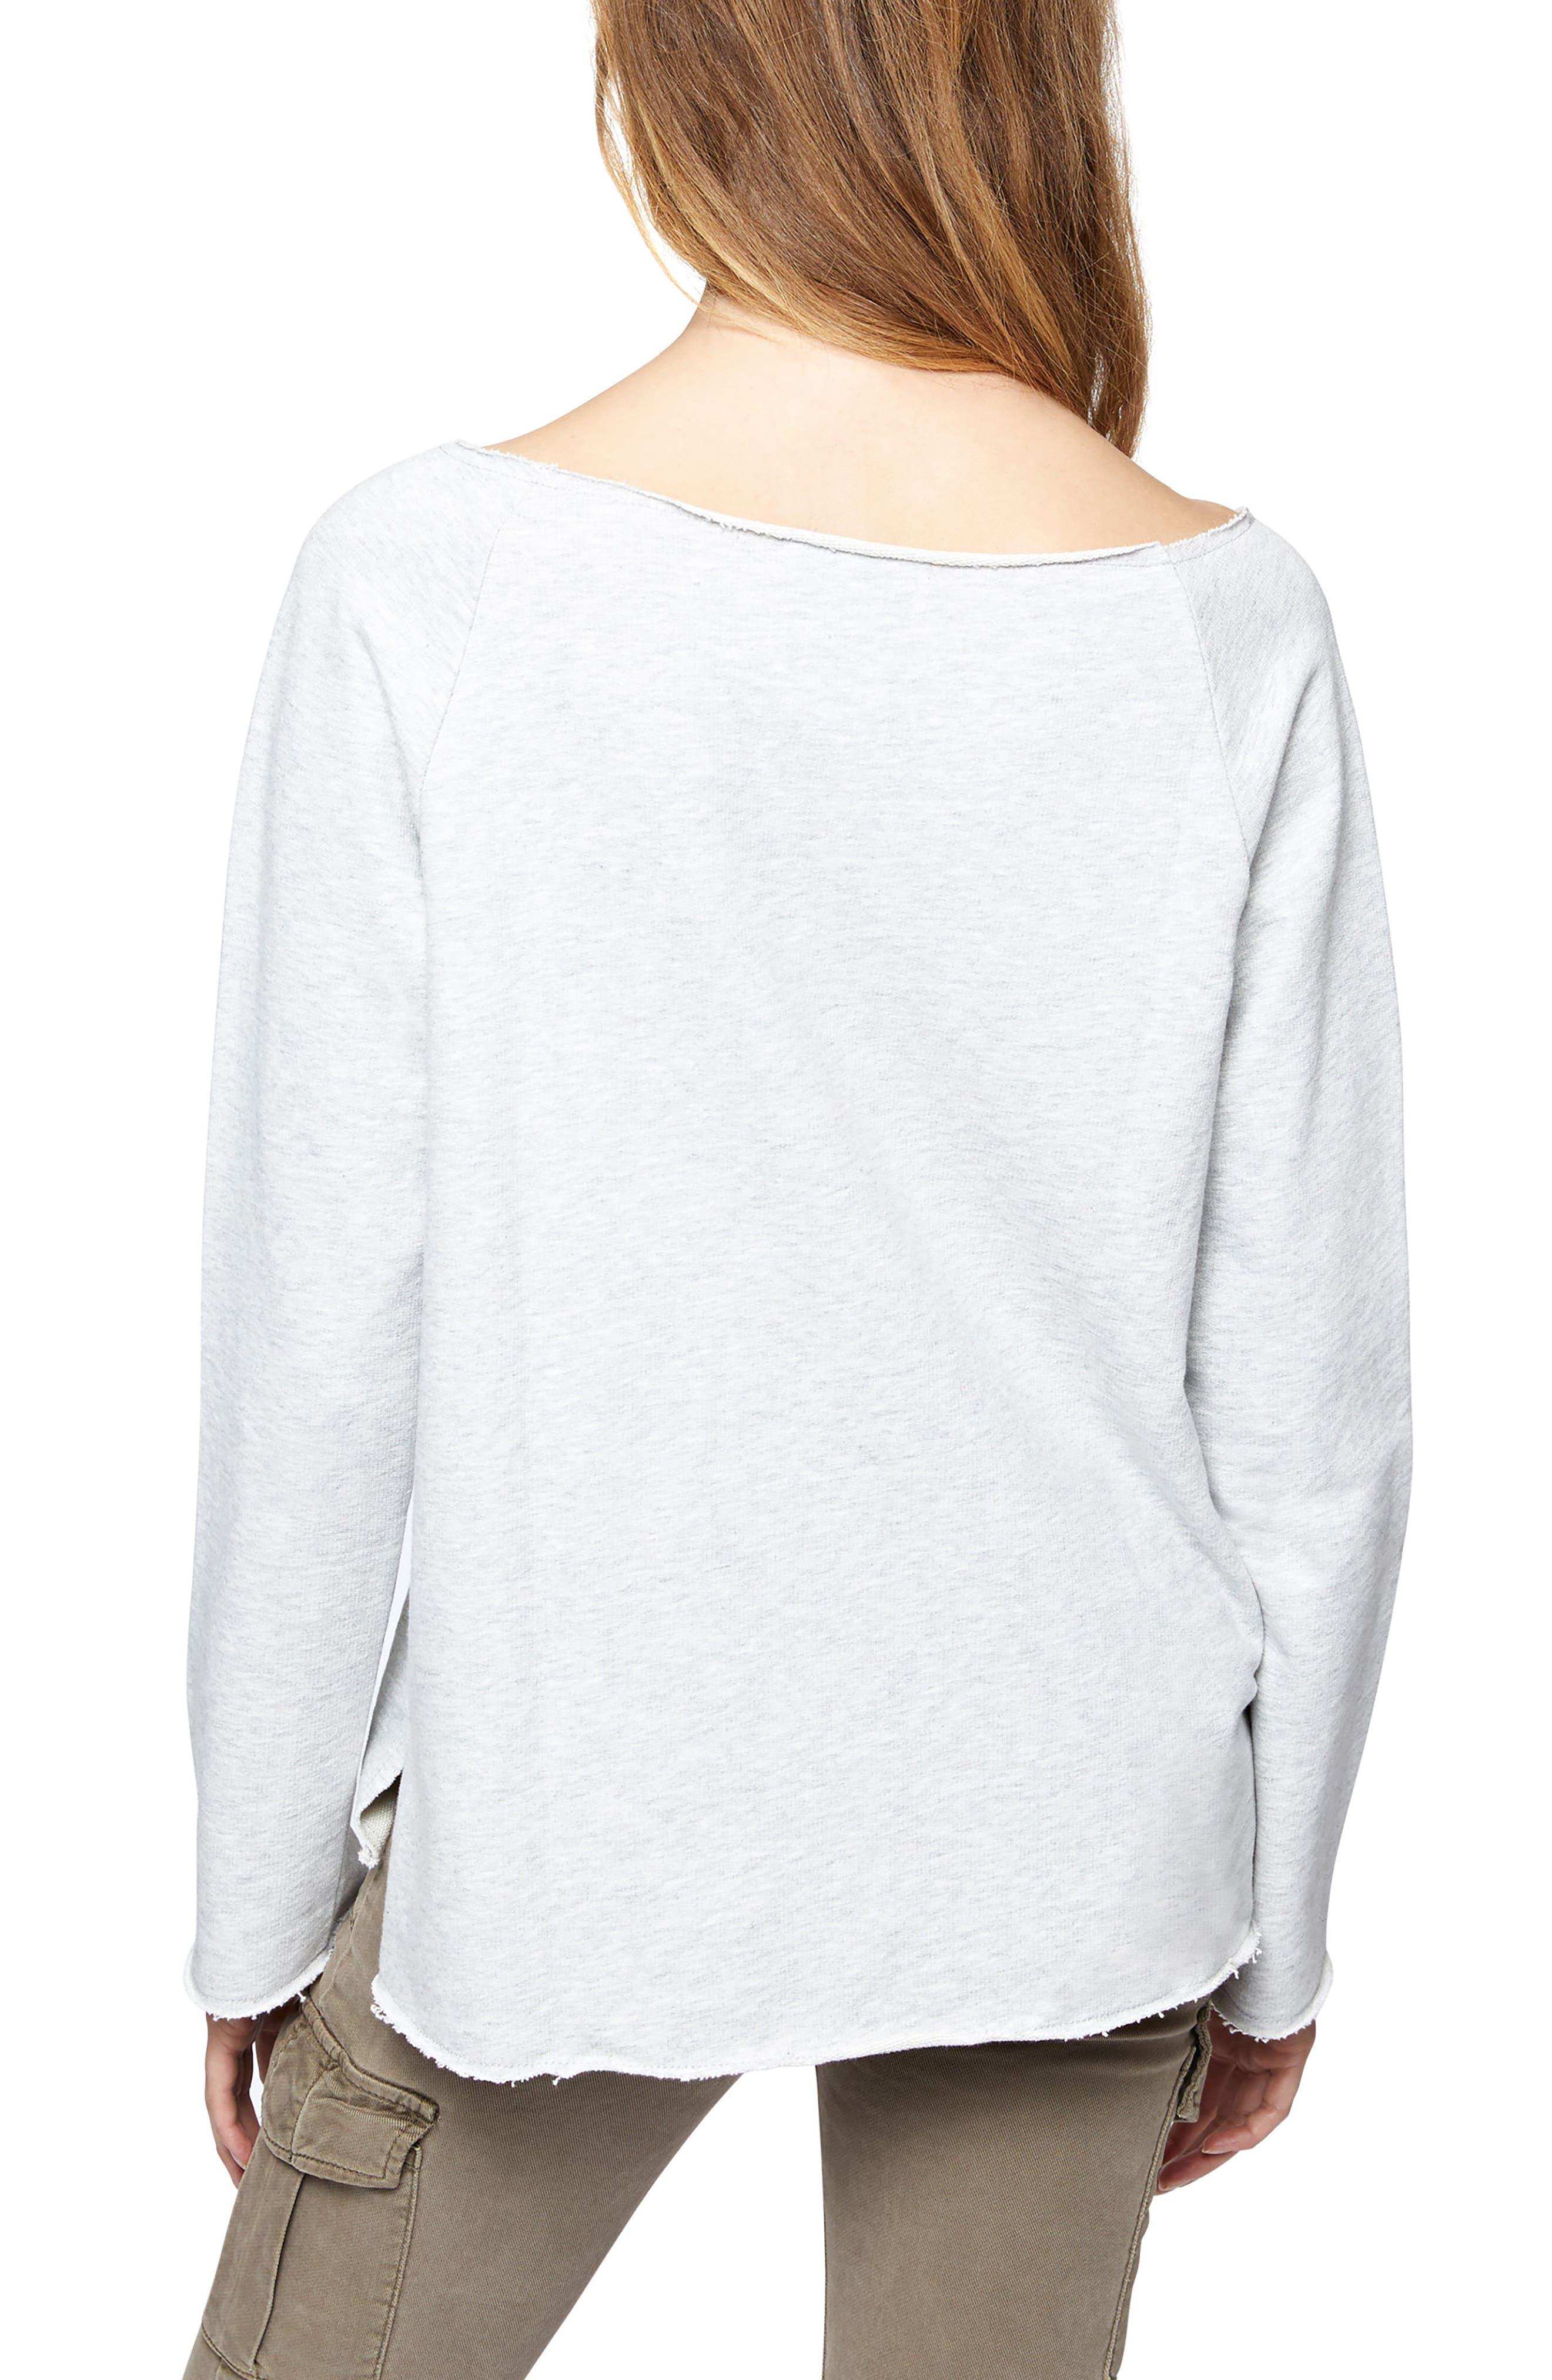 Galaxy Sequin Sweatshirt,                             Alternate thumbnail 2, color,                             050